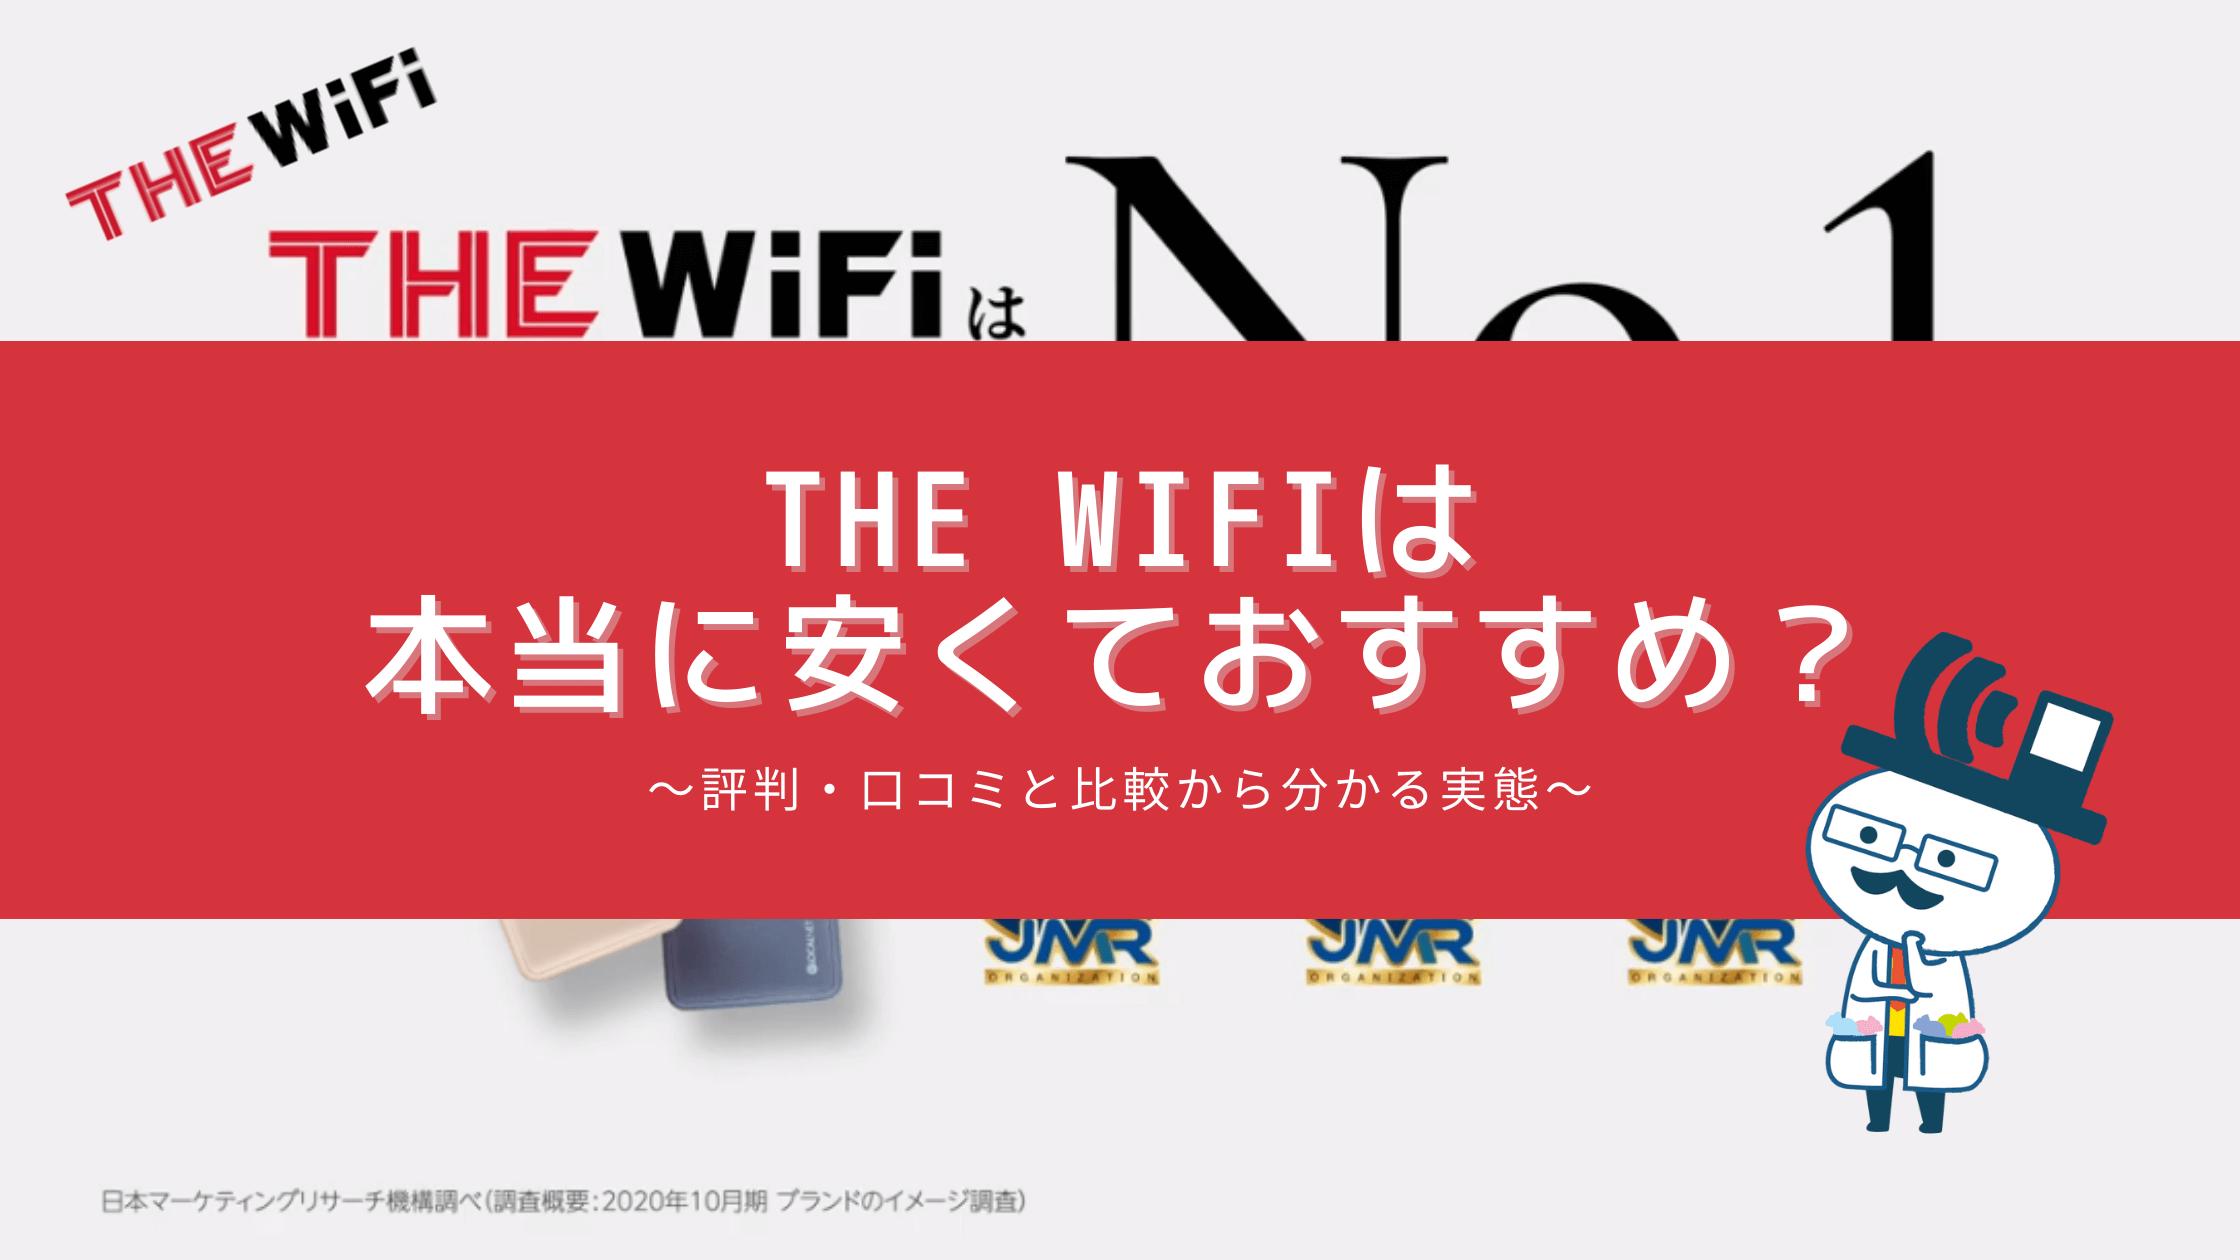 THE WiFiは本当に安くておすすめ?評判・口コミと比較からわかる実態